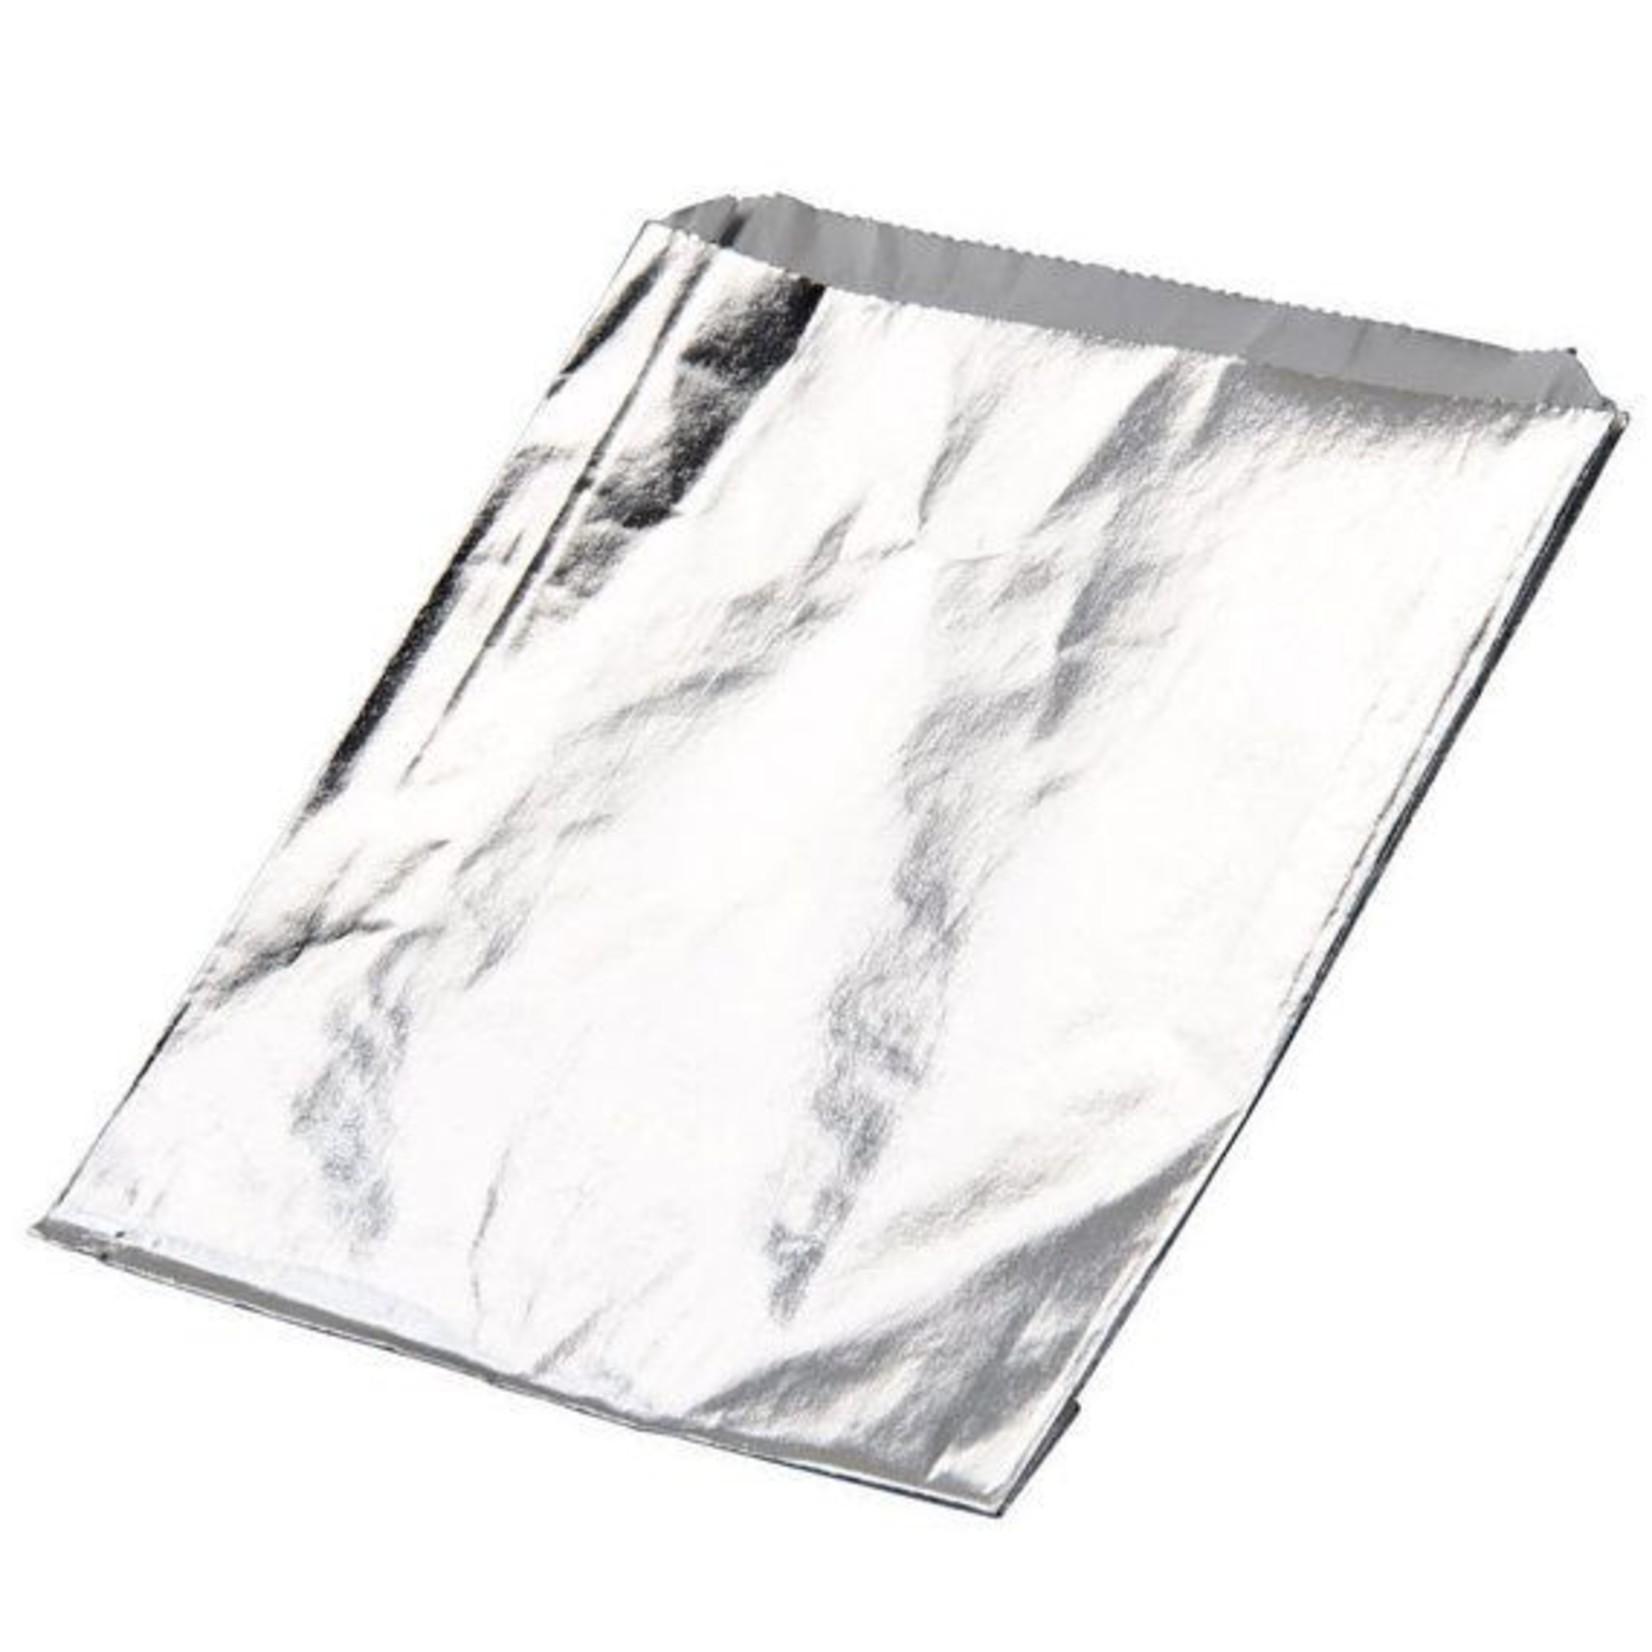 Bags-Foil-Hamburger-5.5''x1.25''x6.75''-50pk